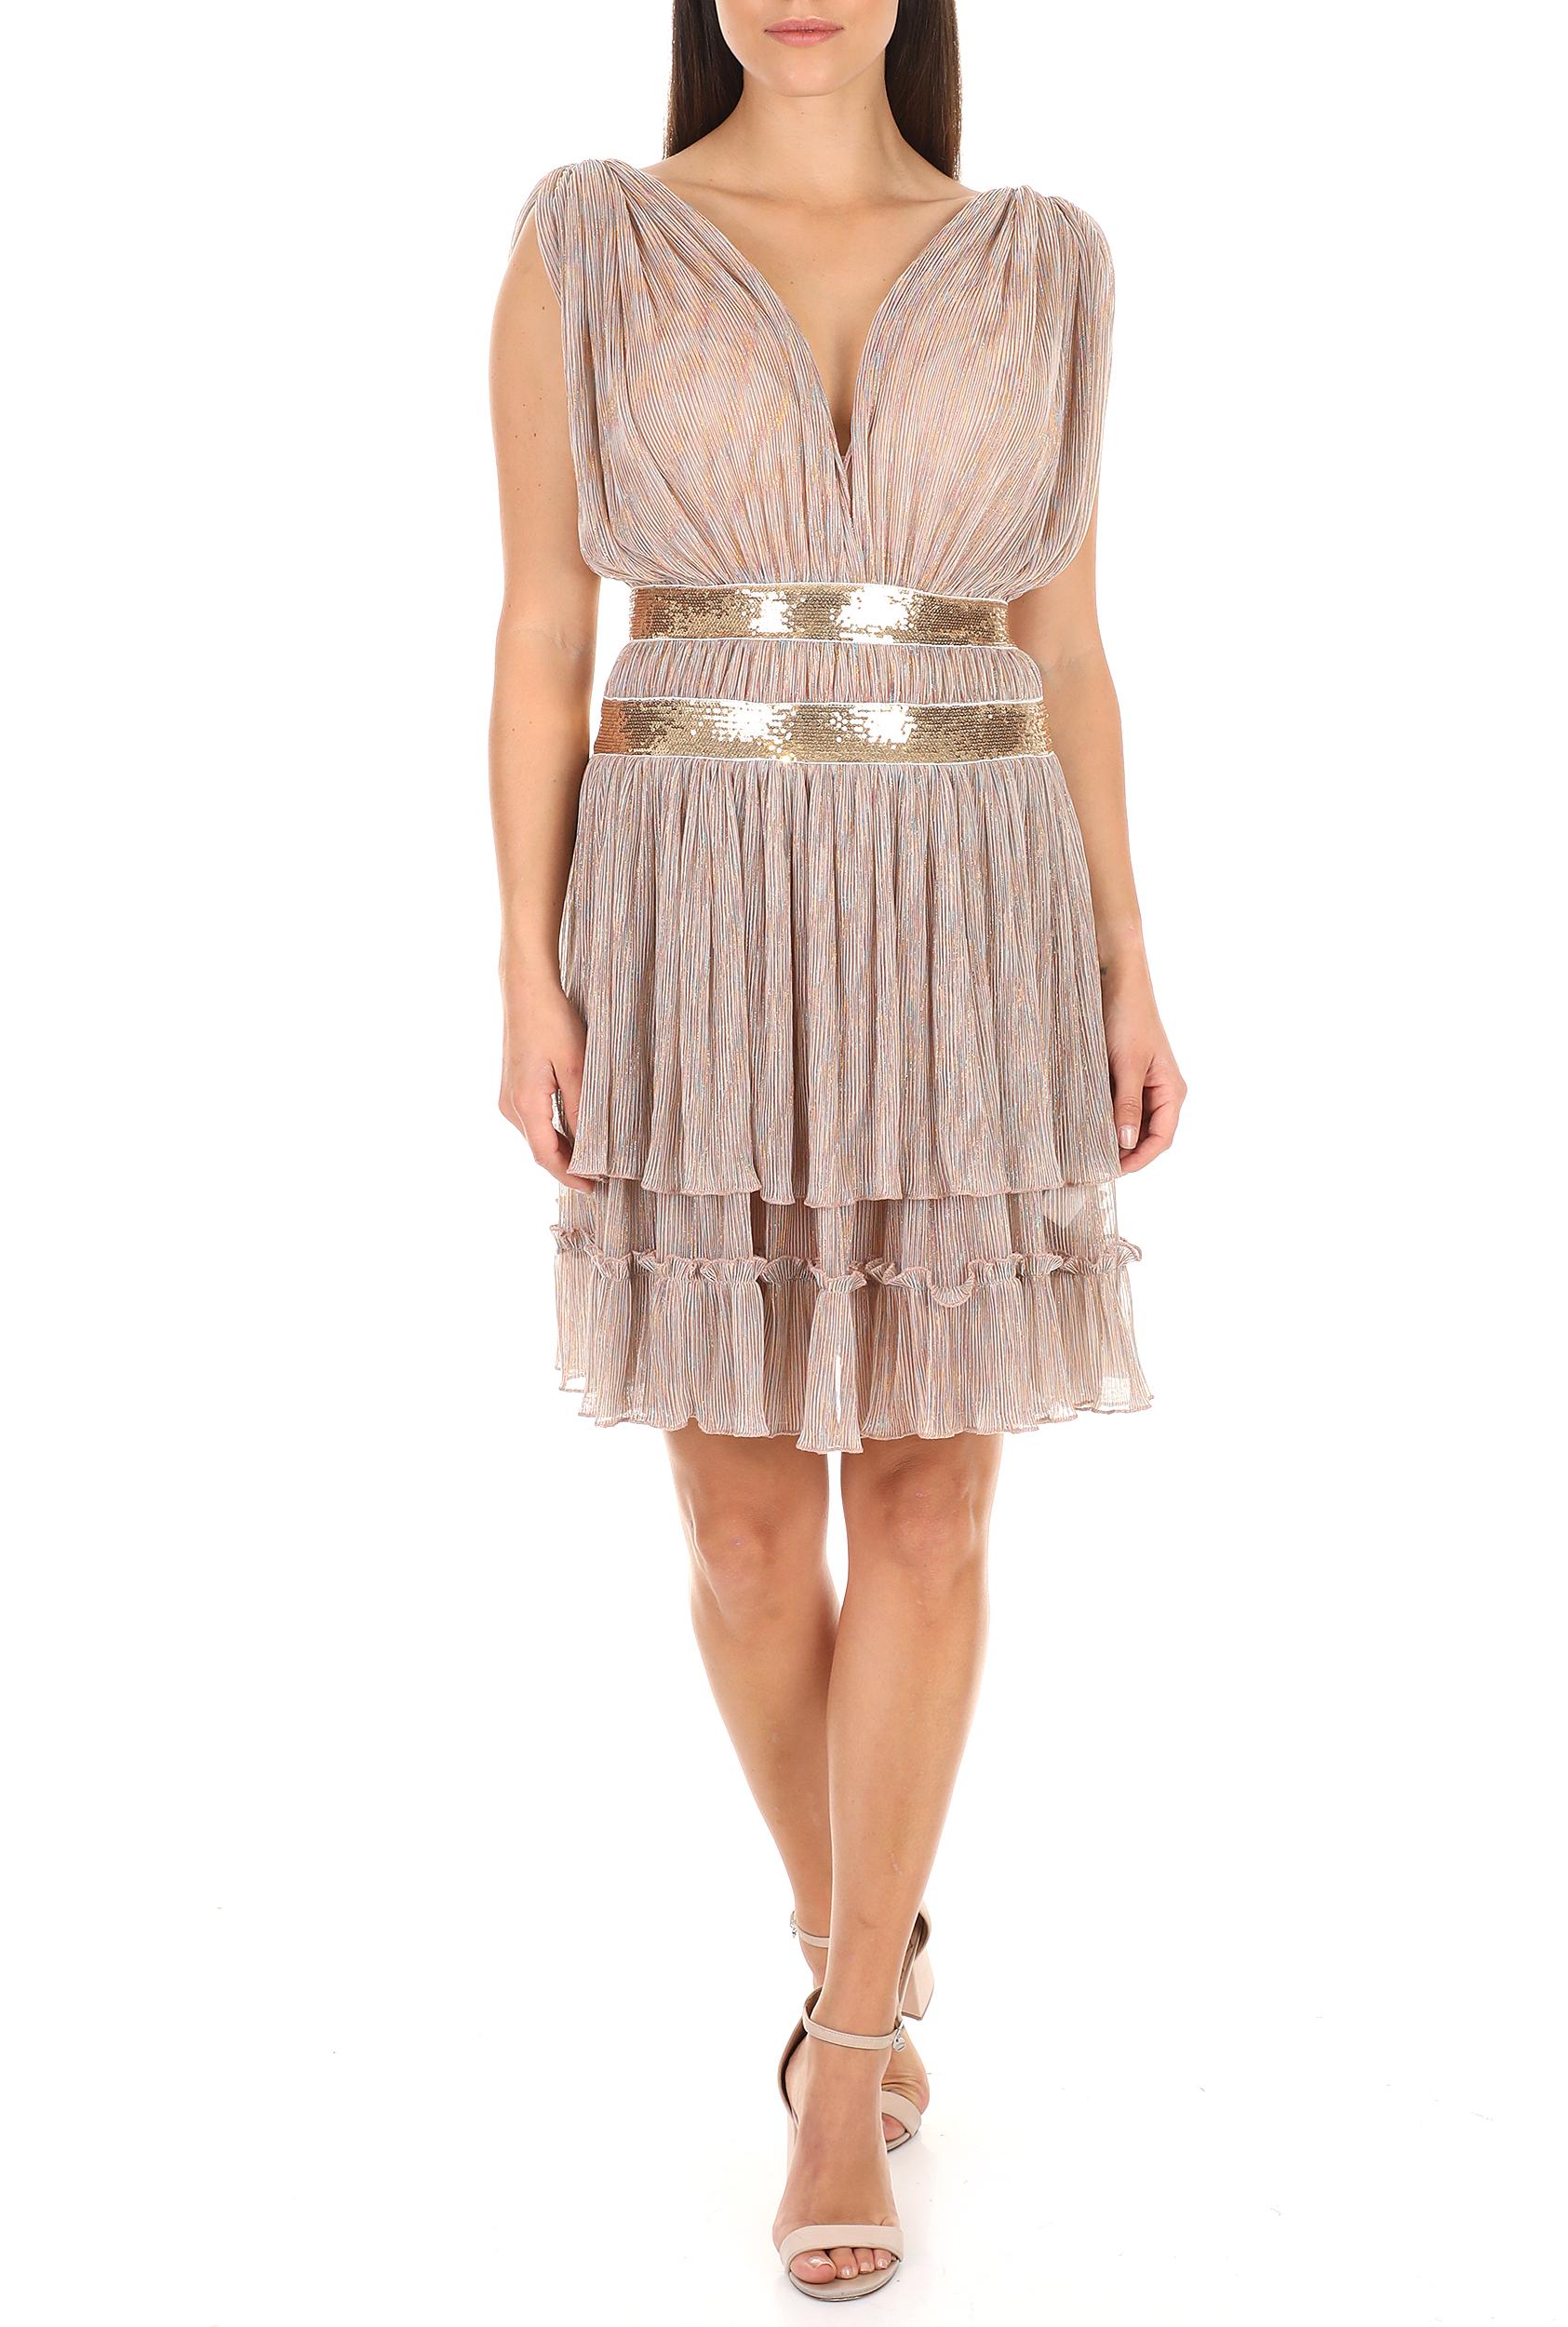 TRAFFIC PEOPLE - Γυναικείο mini φόρεμα TRAFFIC PEOPLE Stay Gold ροζ γυναικεία ρούχα φόρεματα μίνι